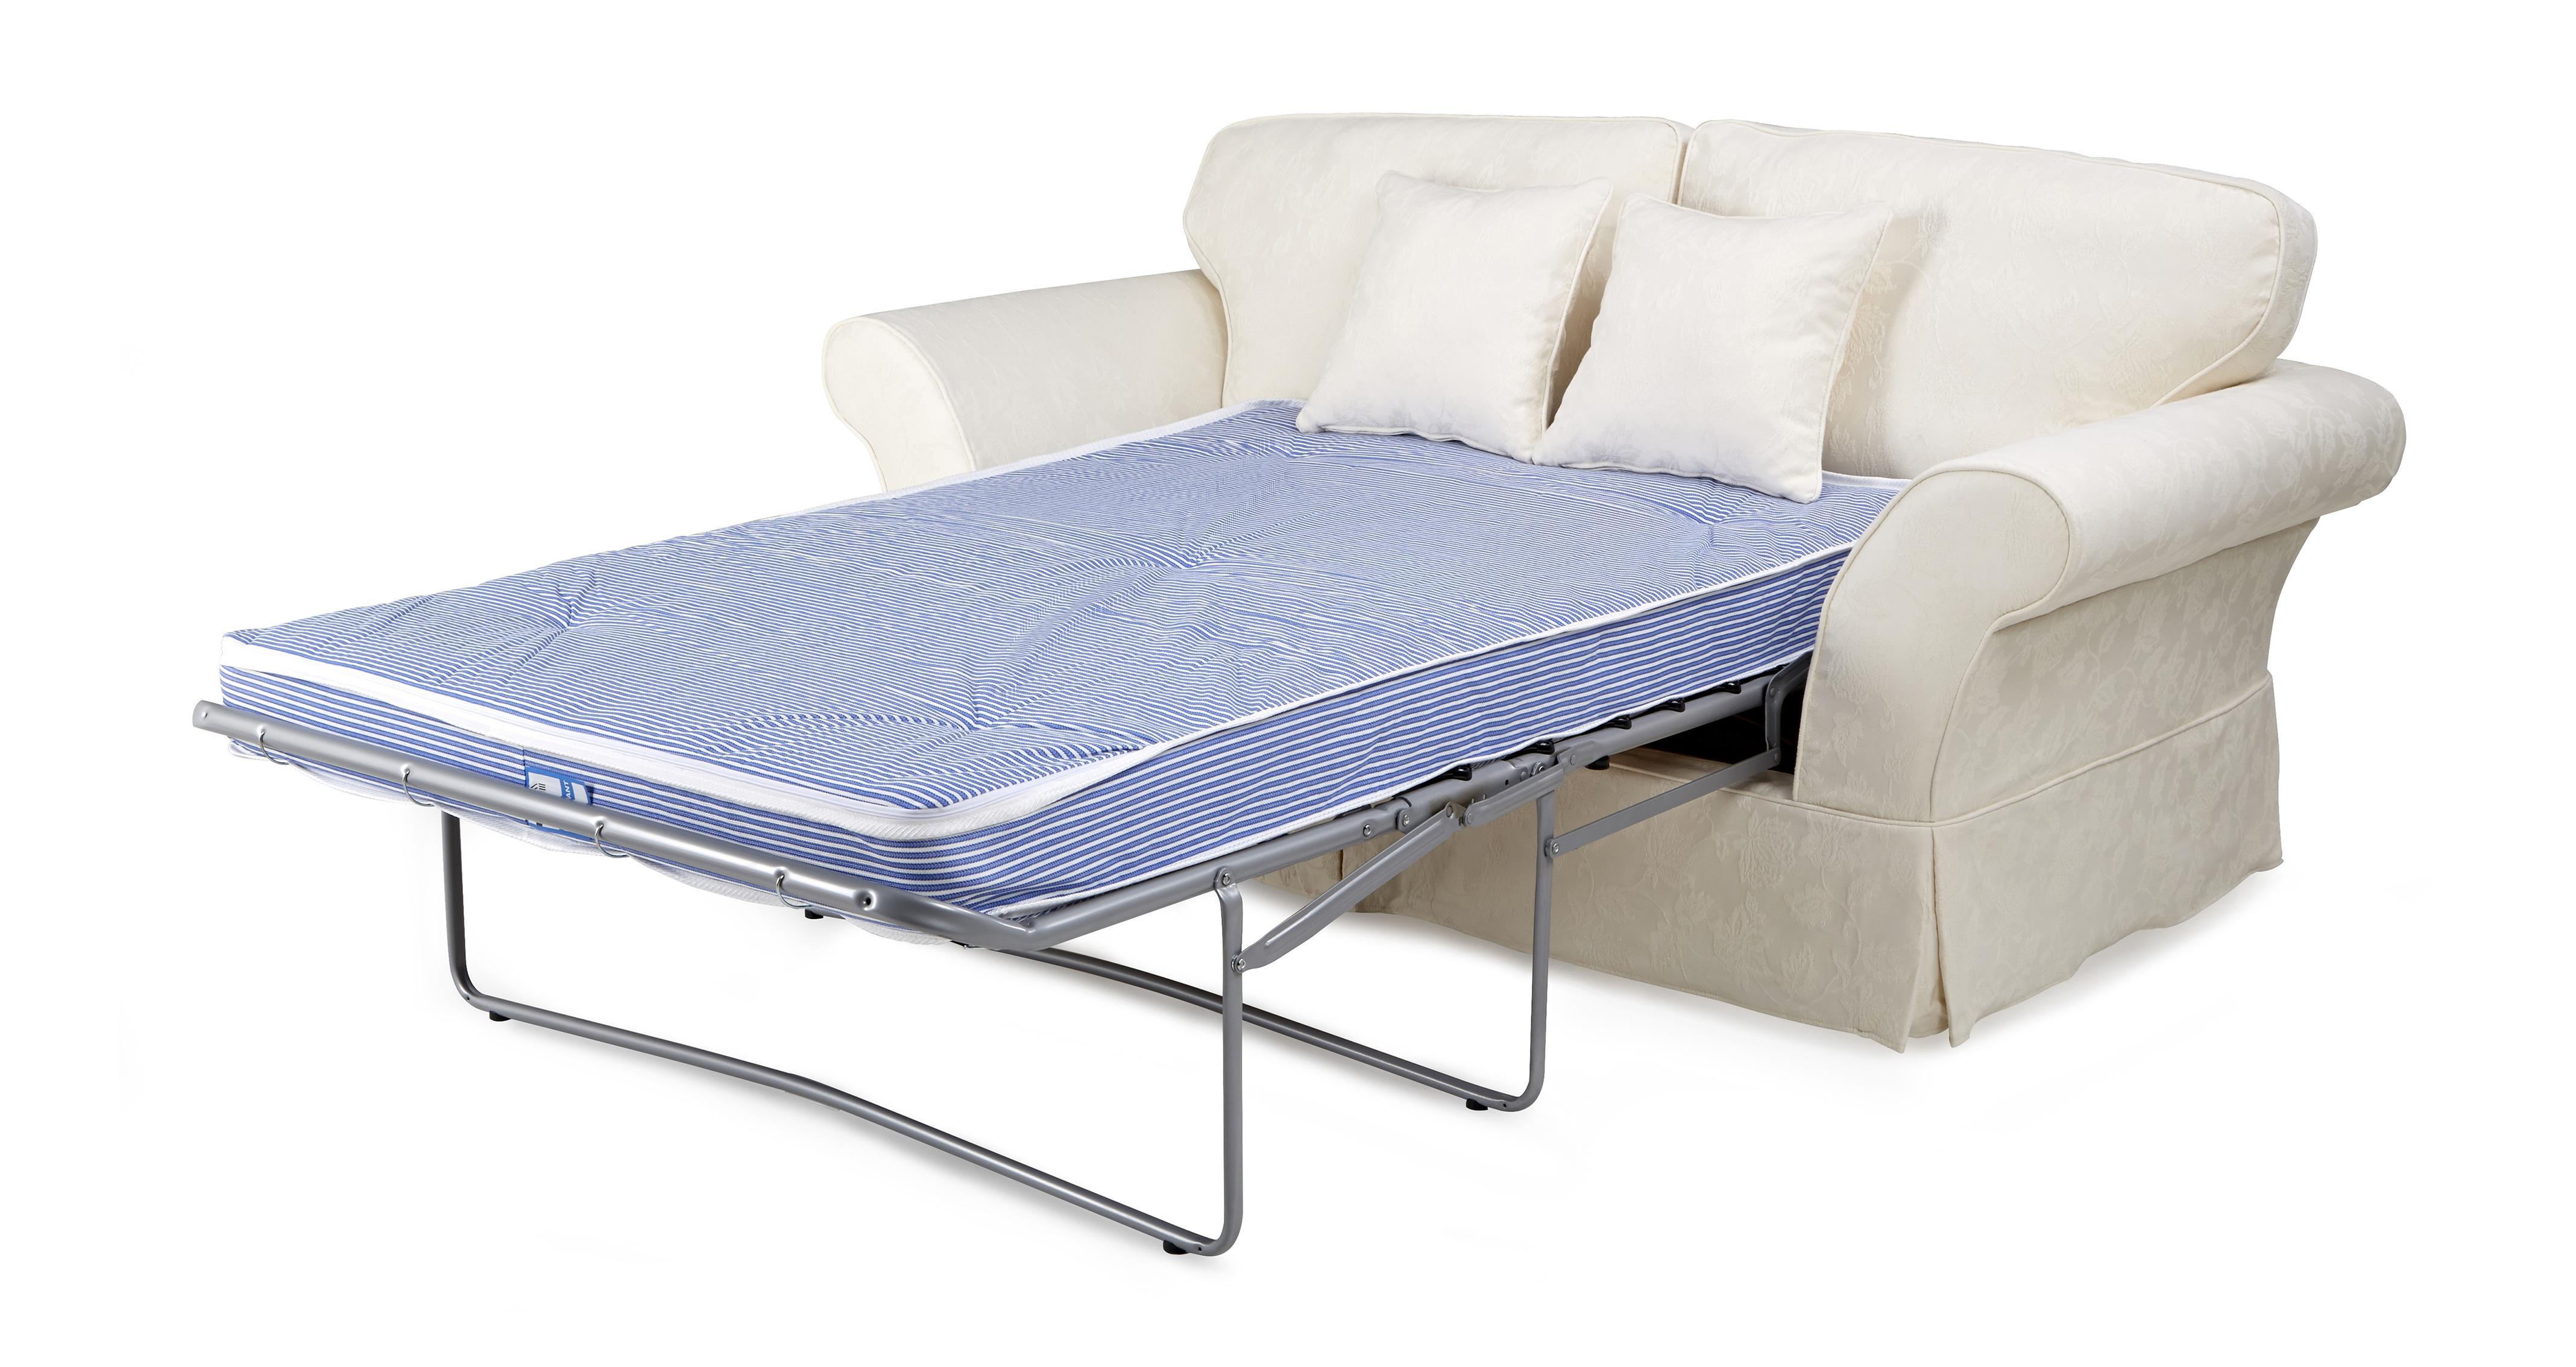 rosa 2 seater formal back deluxe sofabed dfs. Black Bedroom Furniture Sets. Home Design Ideas